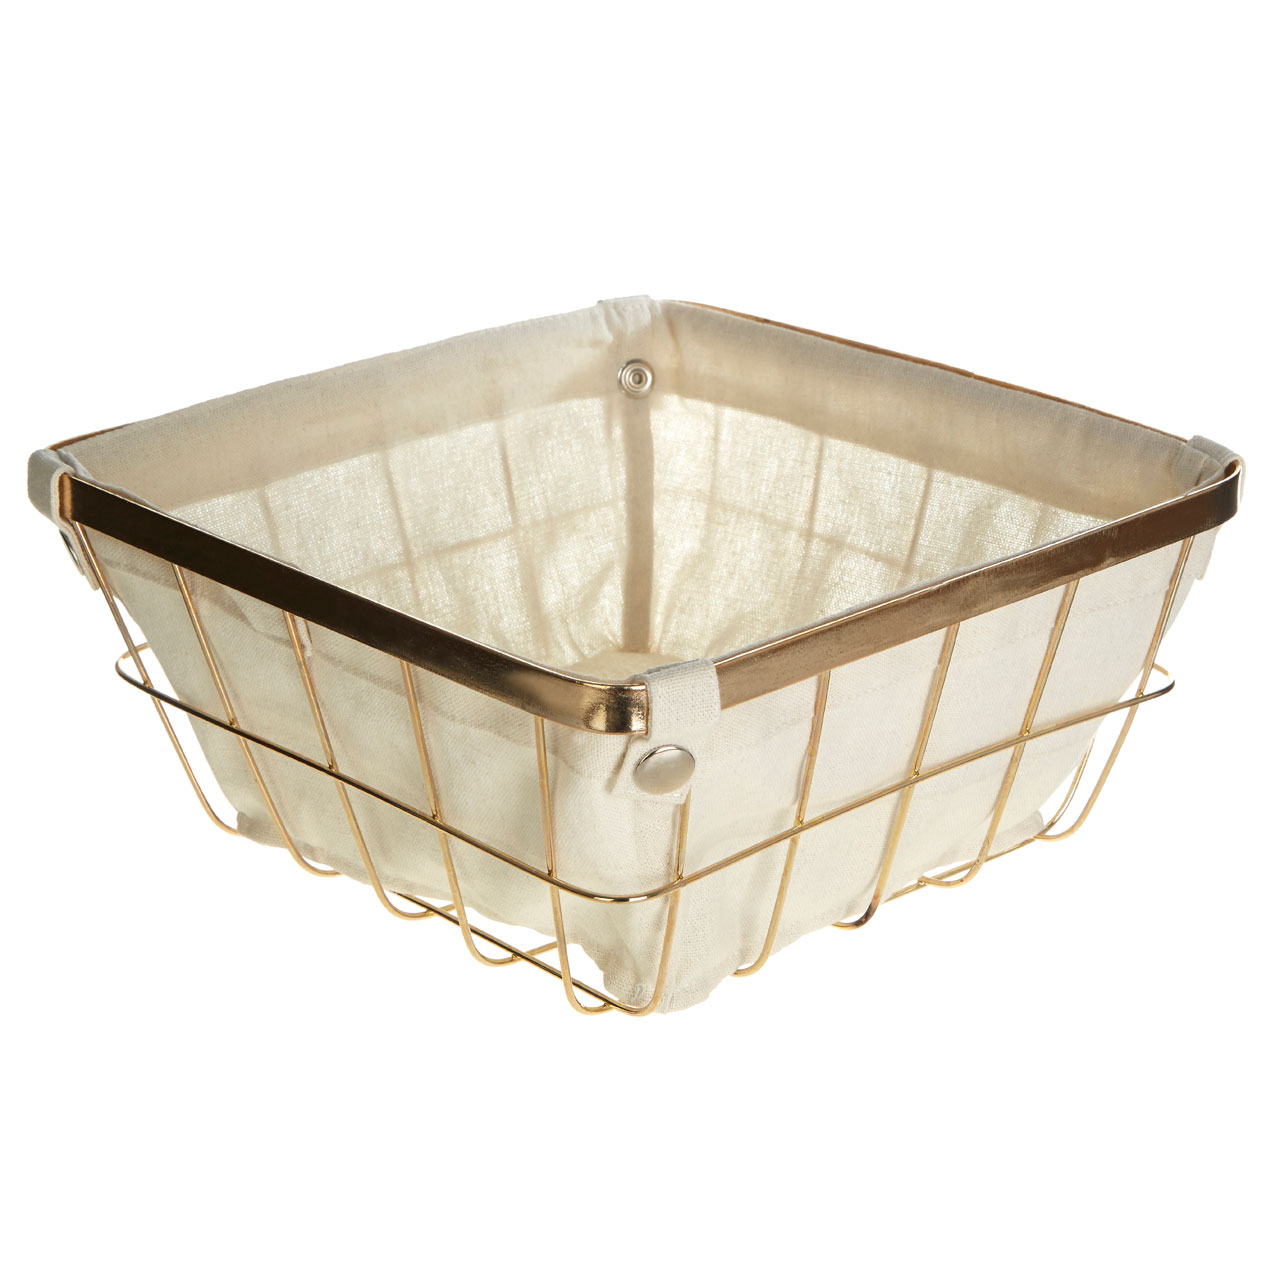 Premier Housewares Square Storage Basket, Gold Plated Wire, Cotton ...